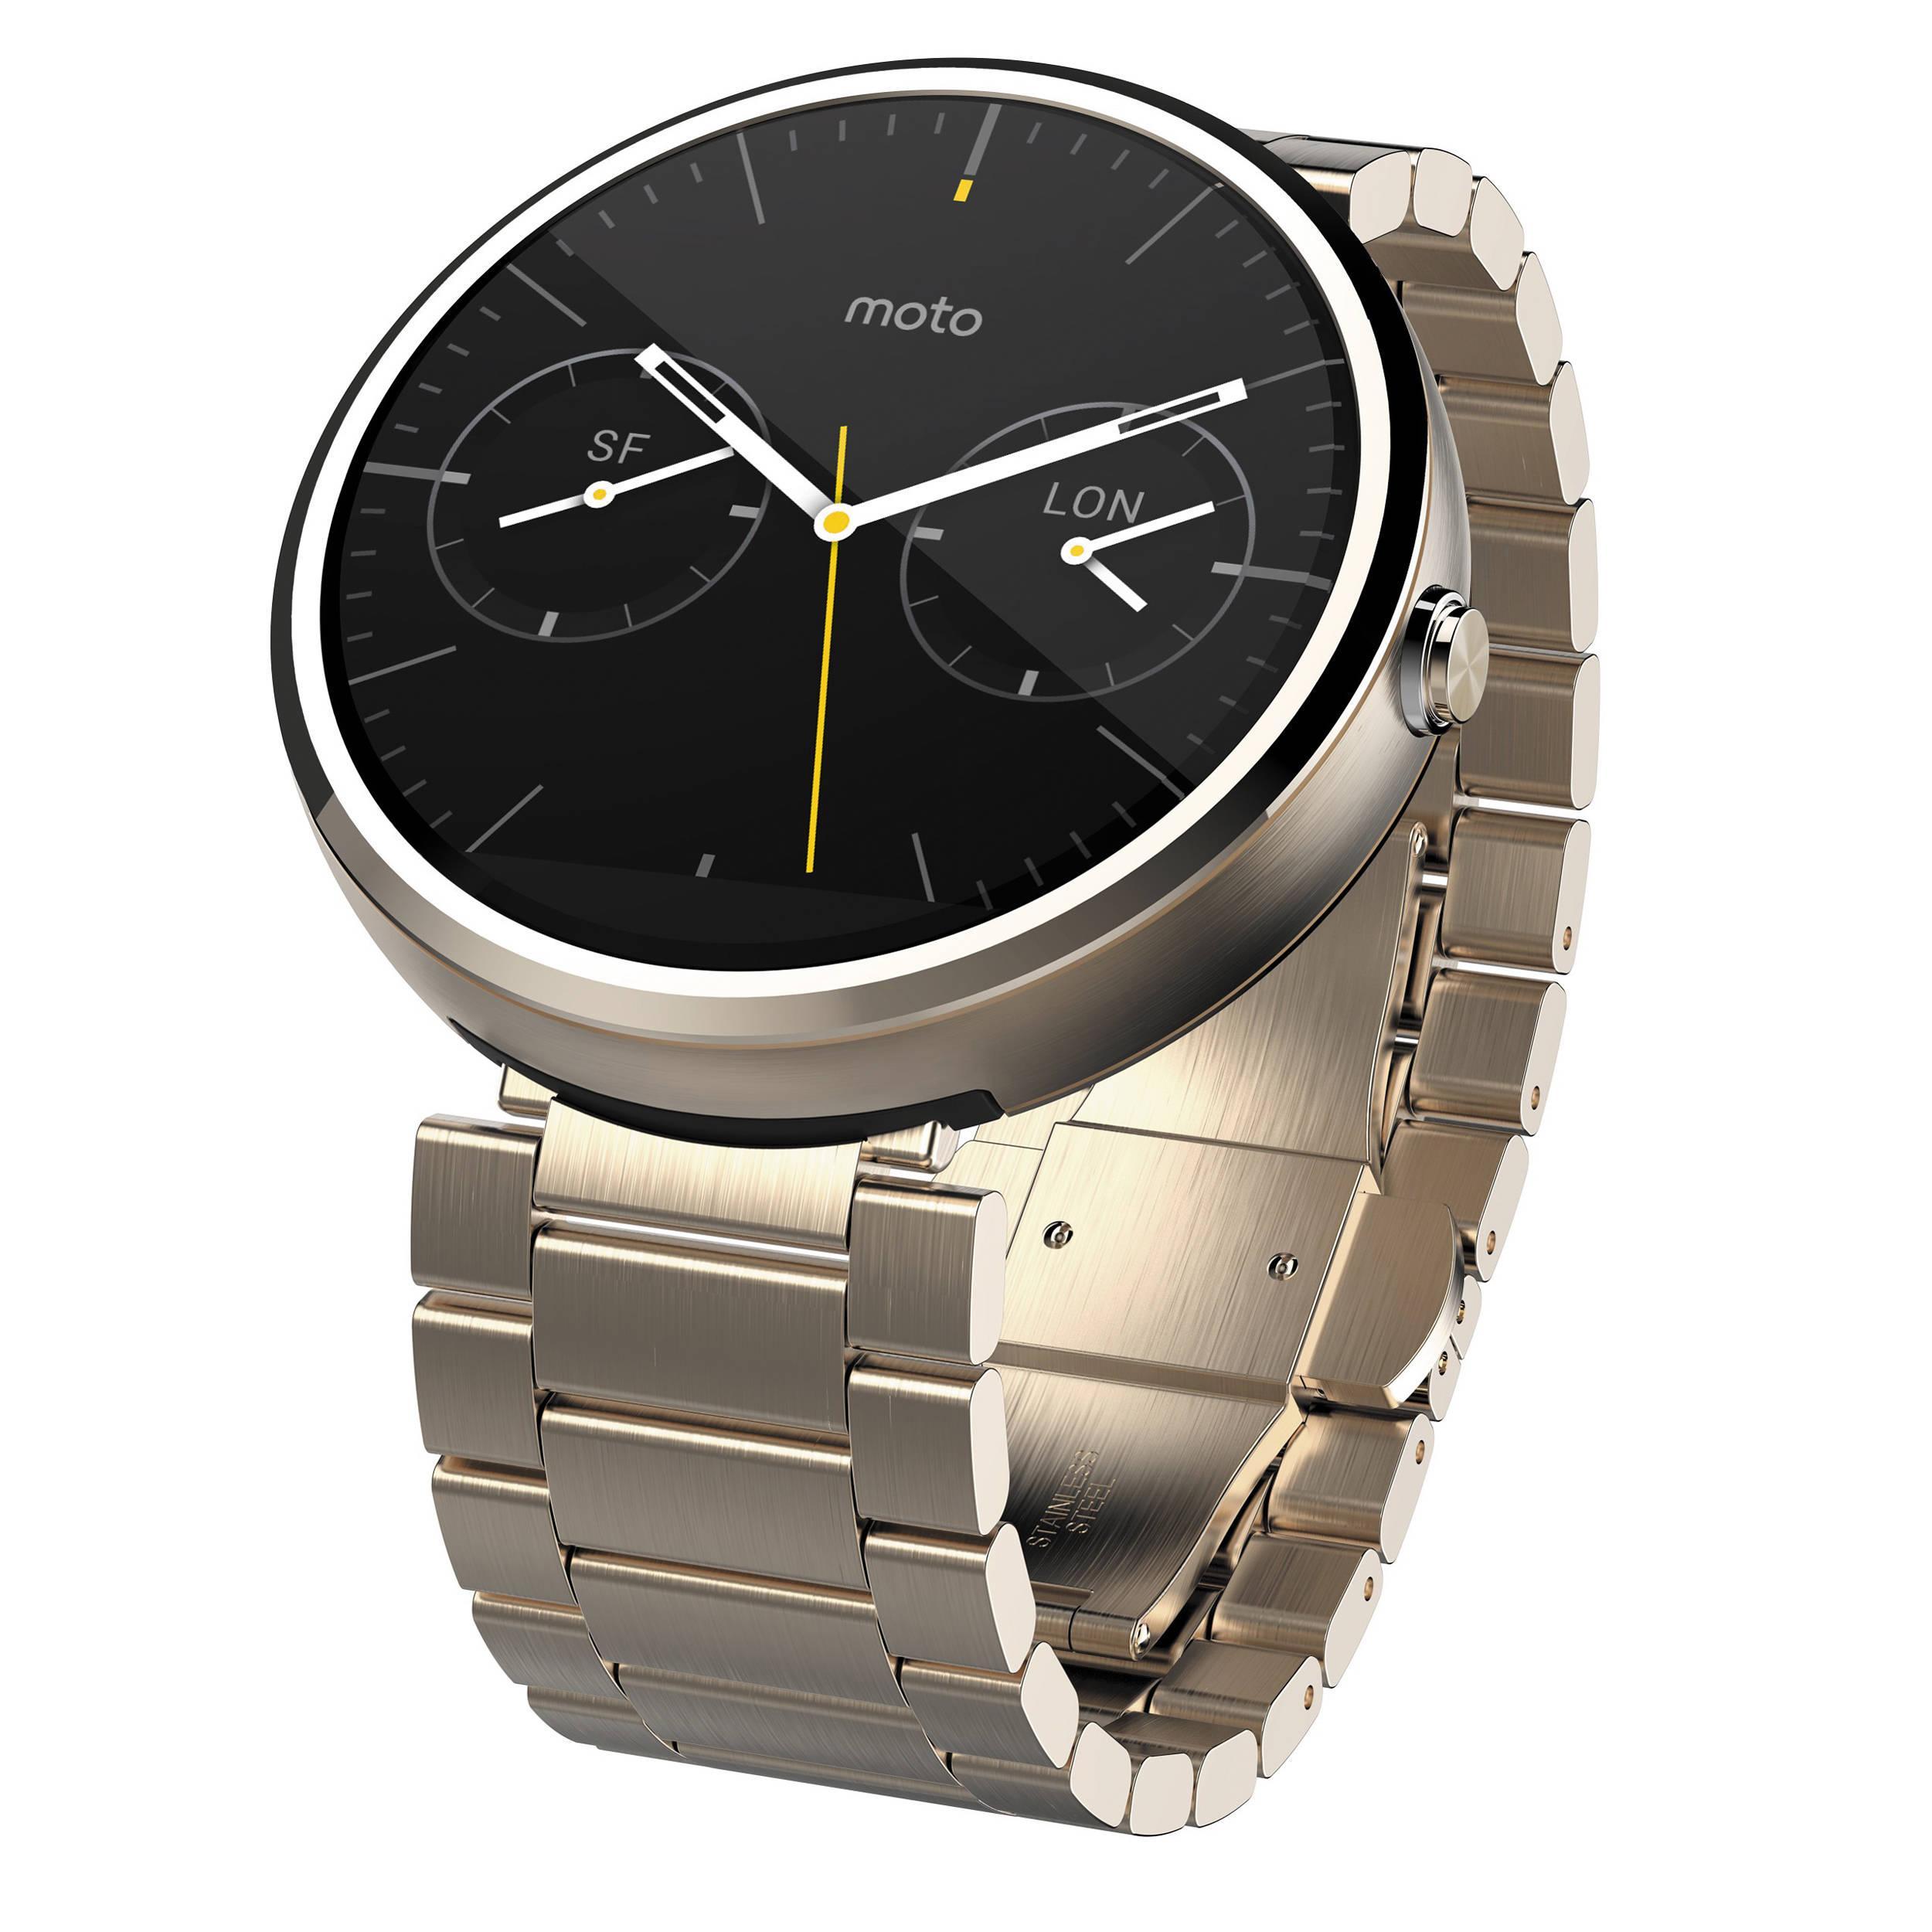 Motorola Moto 360 Smartwatch 00571NARTL B&H Photo Video